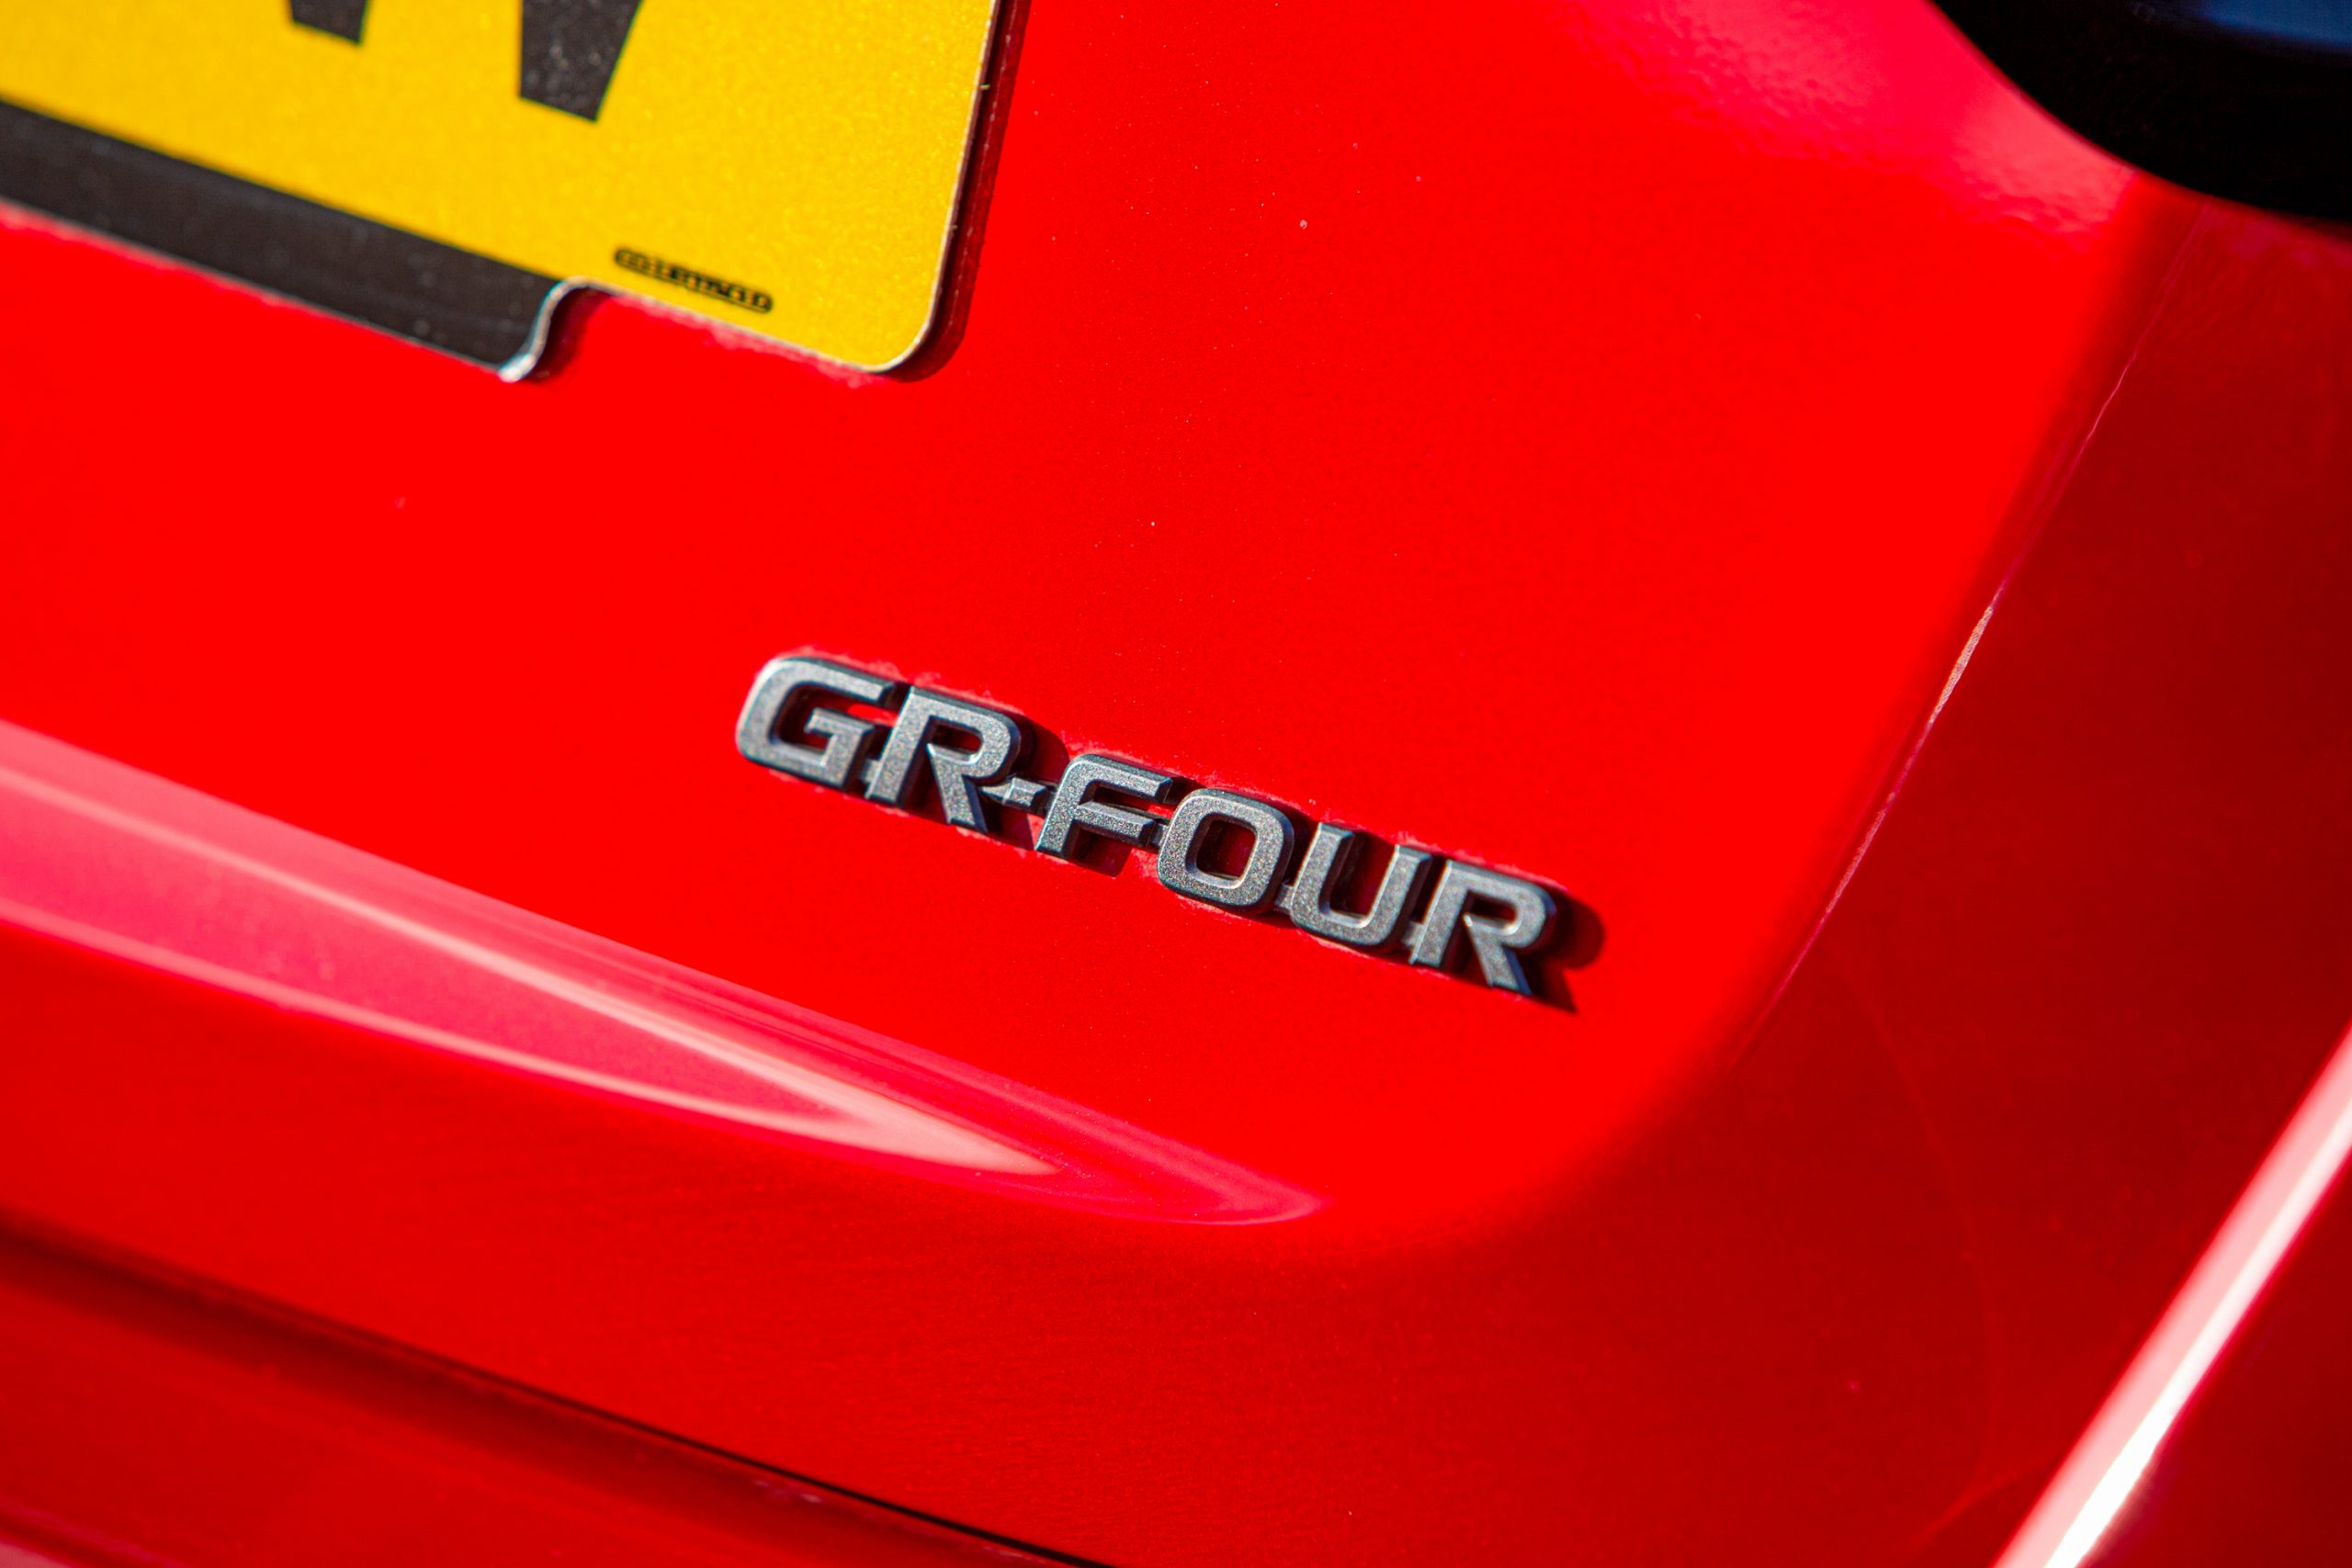 GR Toyota Yaris badge